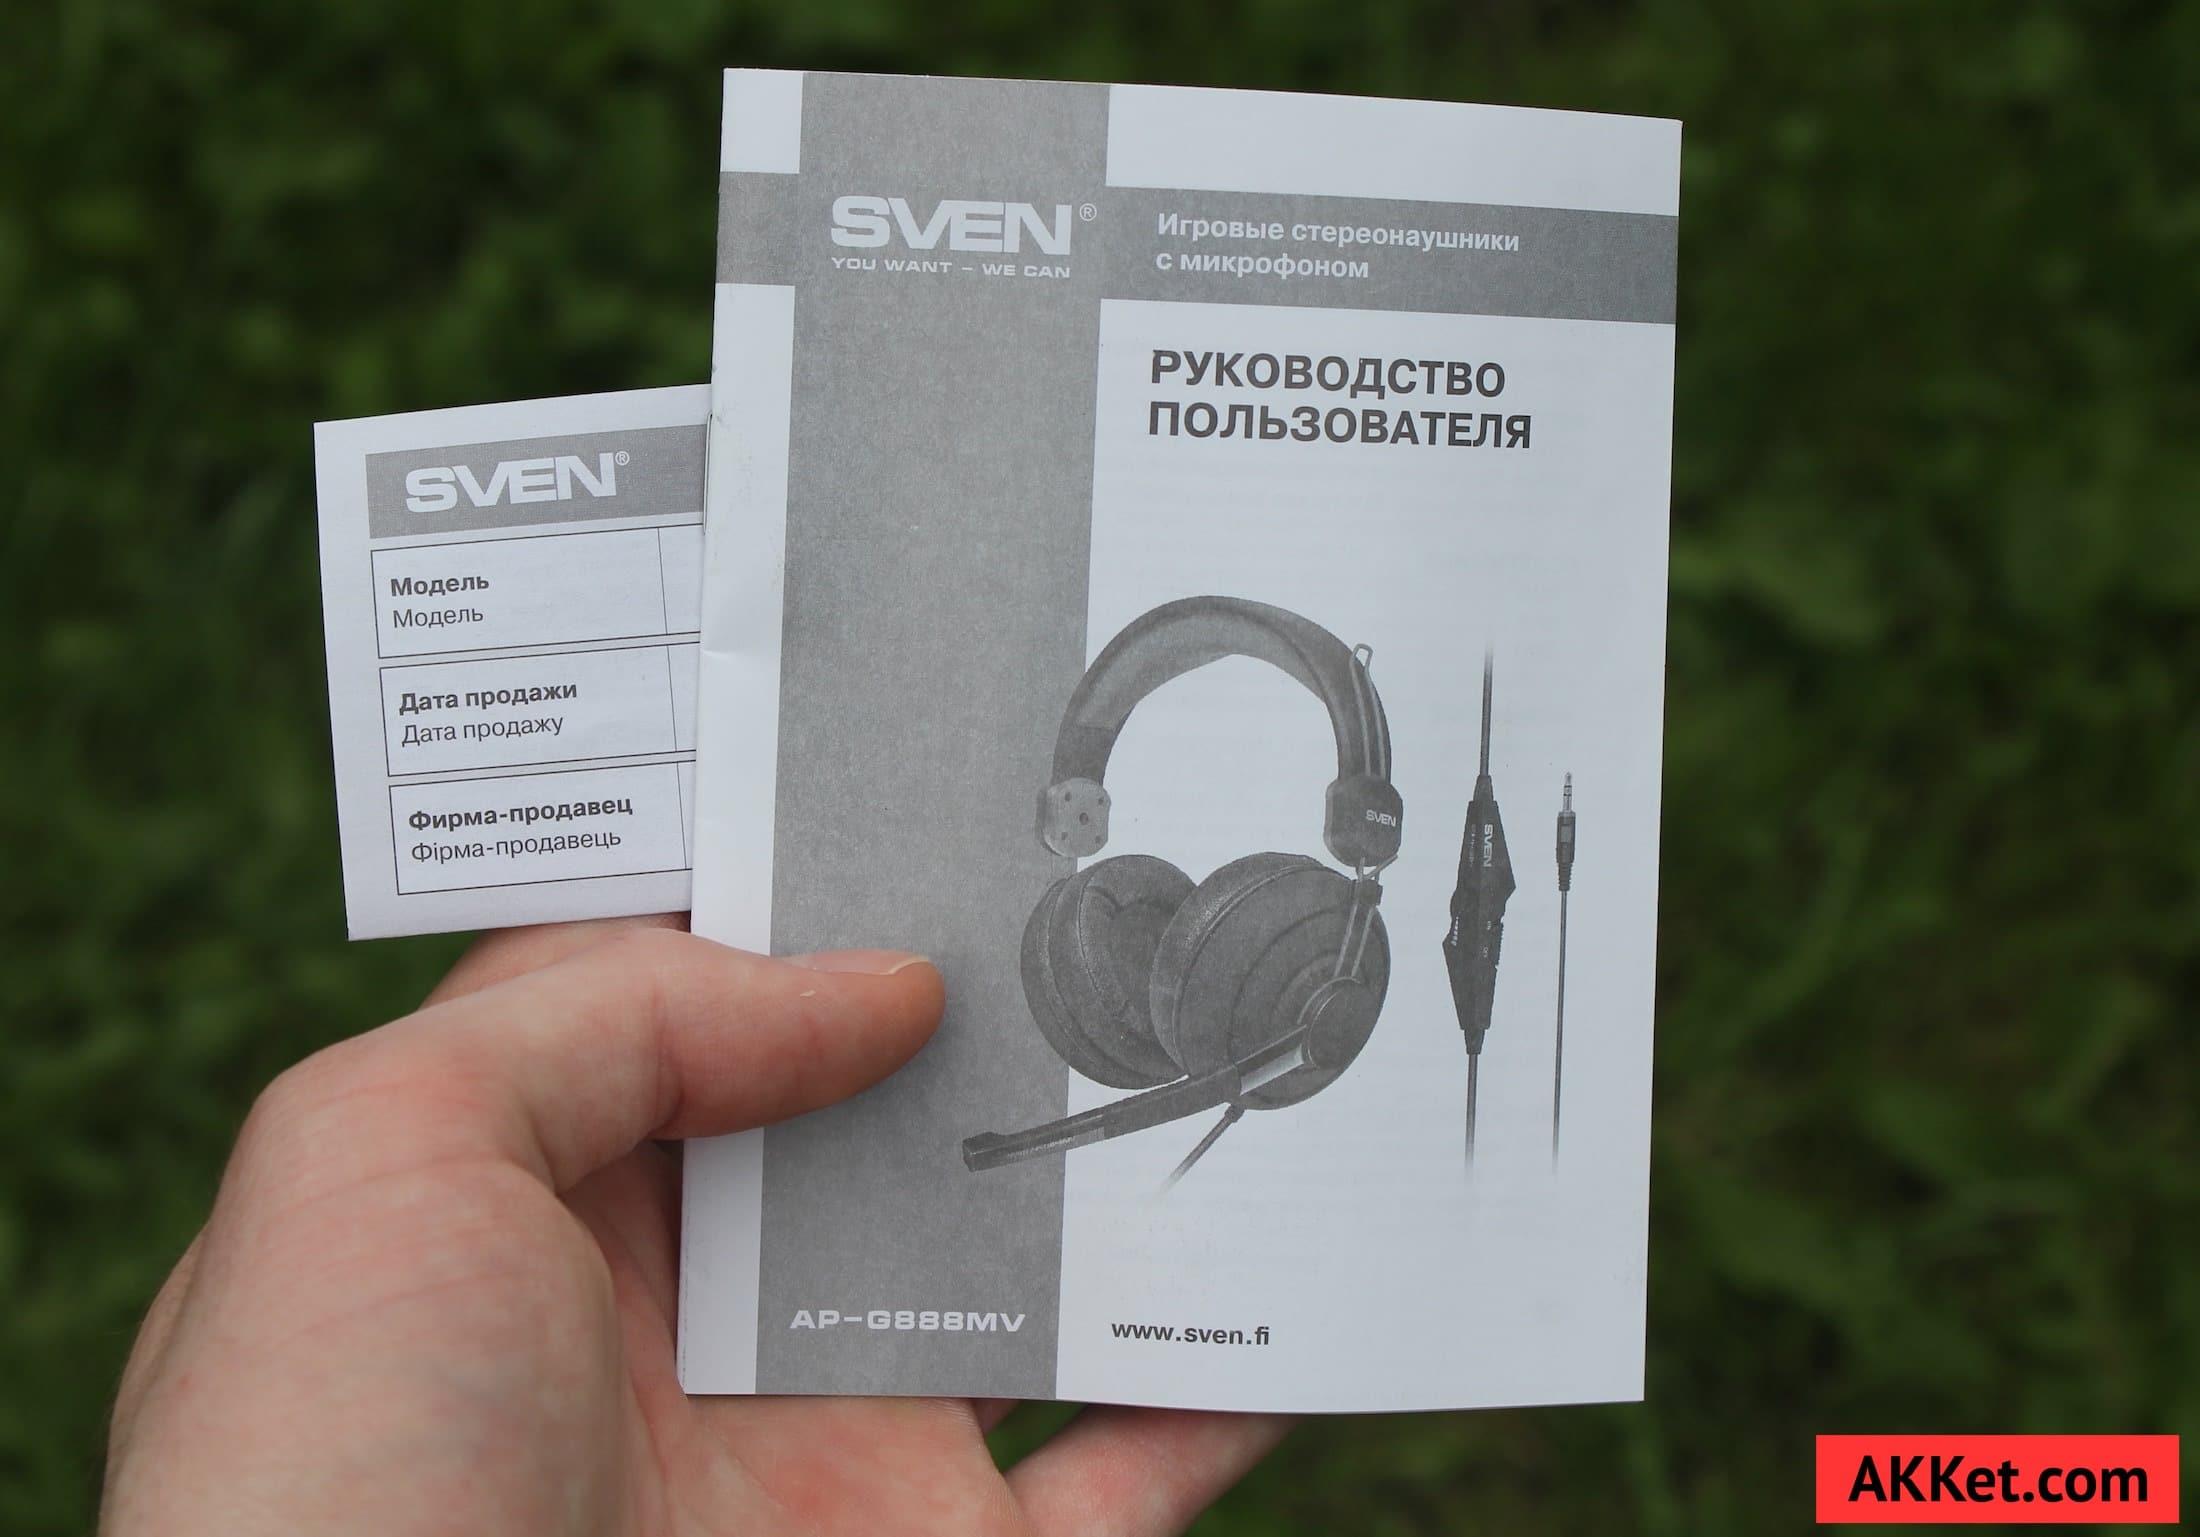 Sven AP-G888MV 3